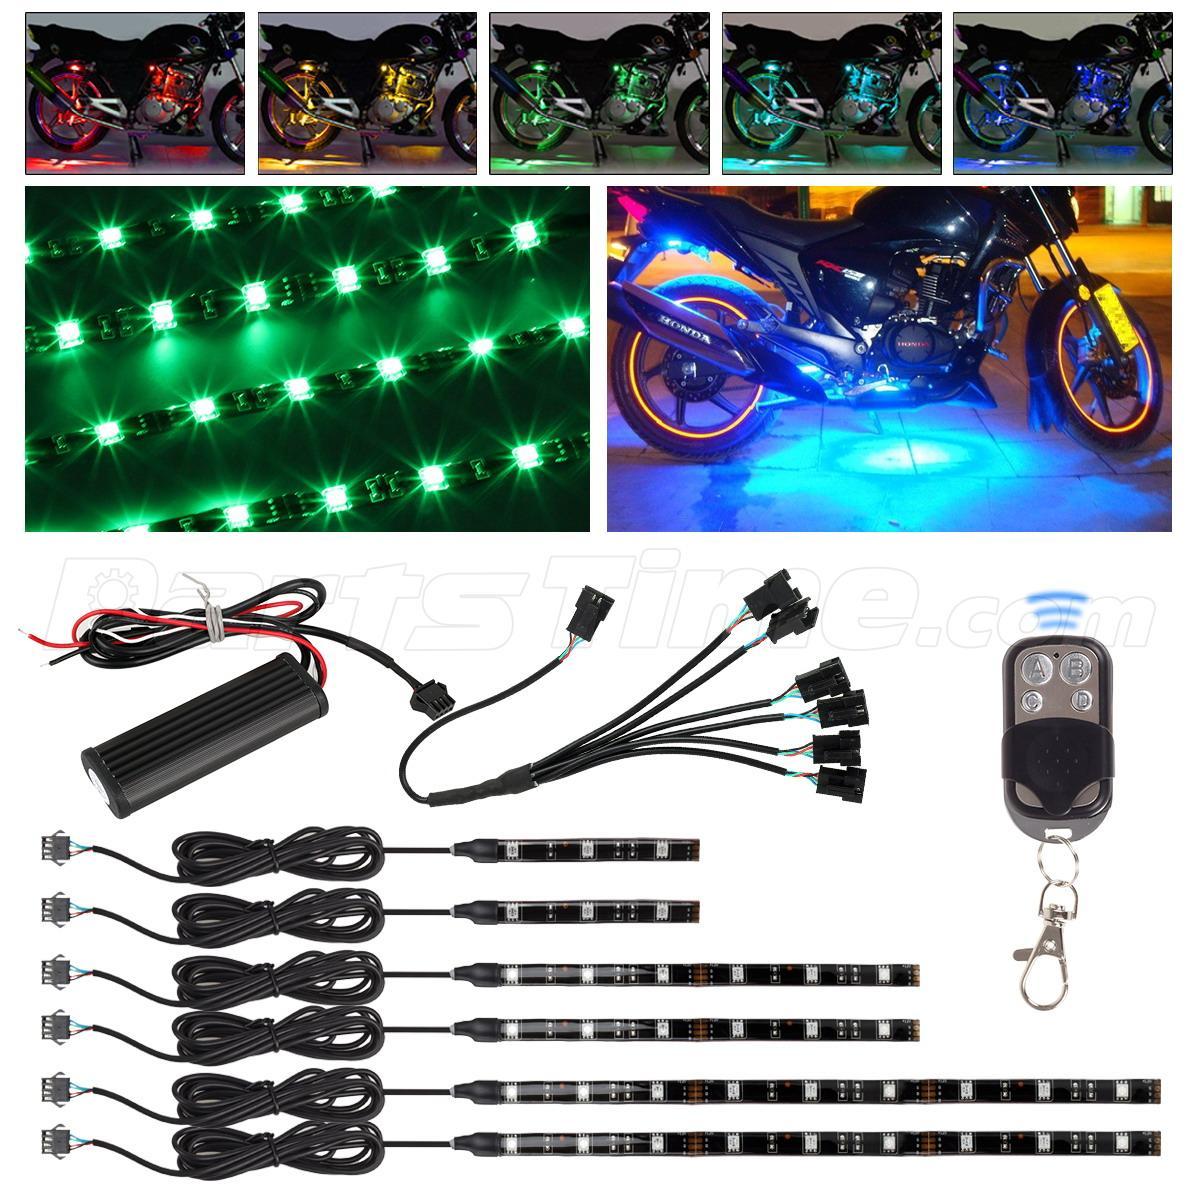 color flexible strip motorcycle 36 led neon accent lighting kit ebay. Black Bedroom Furniture Sets. Home Design Ideas